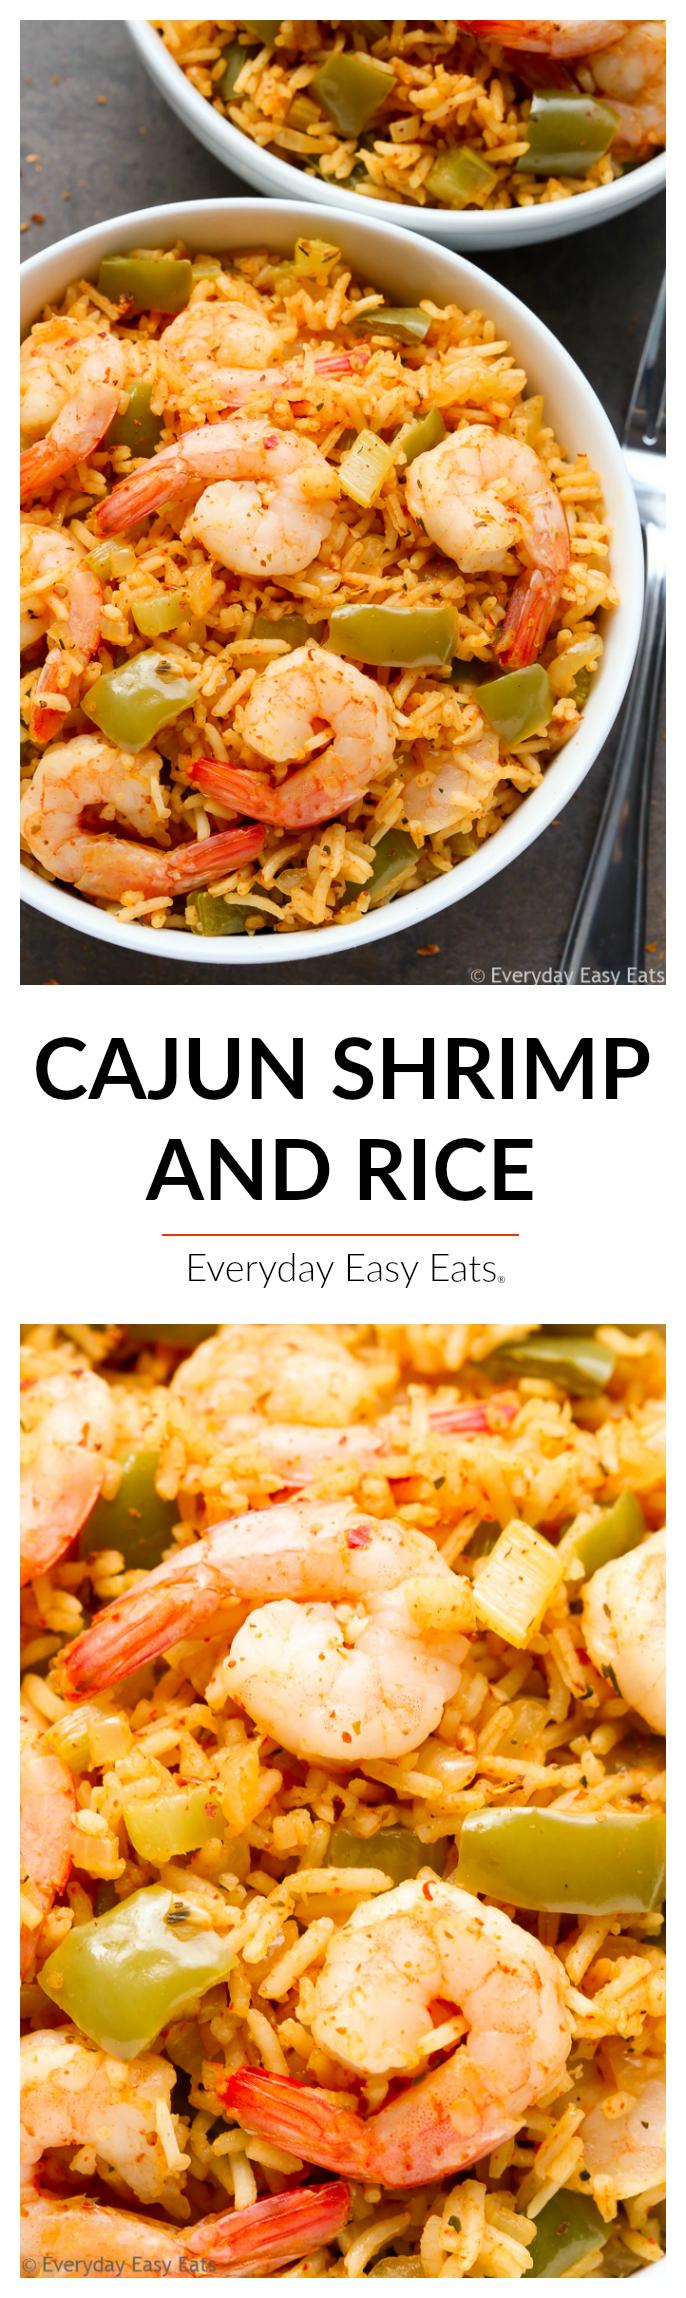 Easy One-Pot Cajun Shrimp and Rice | Recipe at EverydayEasyEats.com